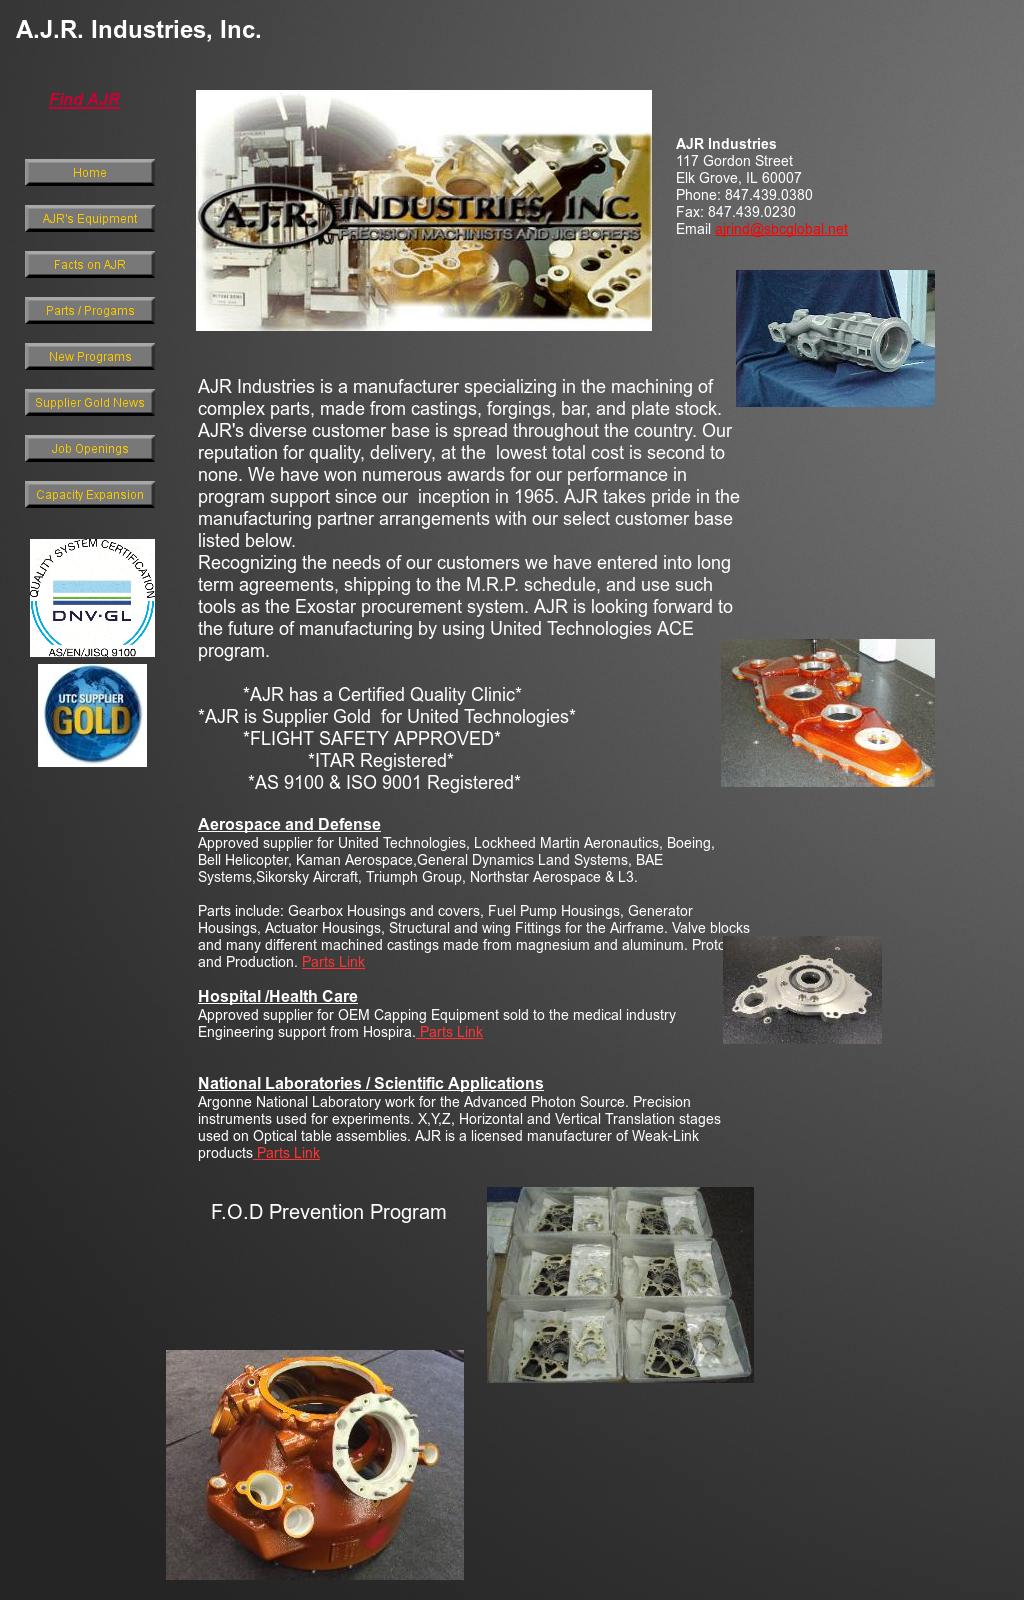 R ajr kinked ajr industries website history kristyandbryce Choice Image